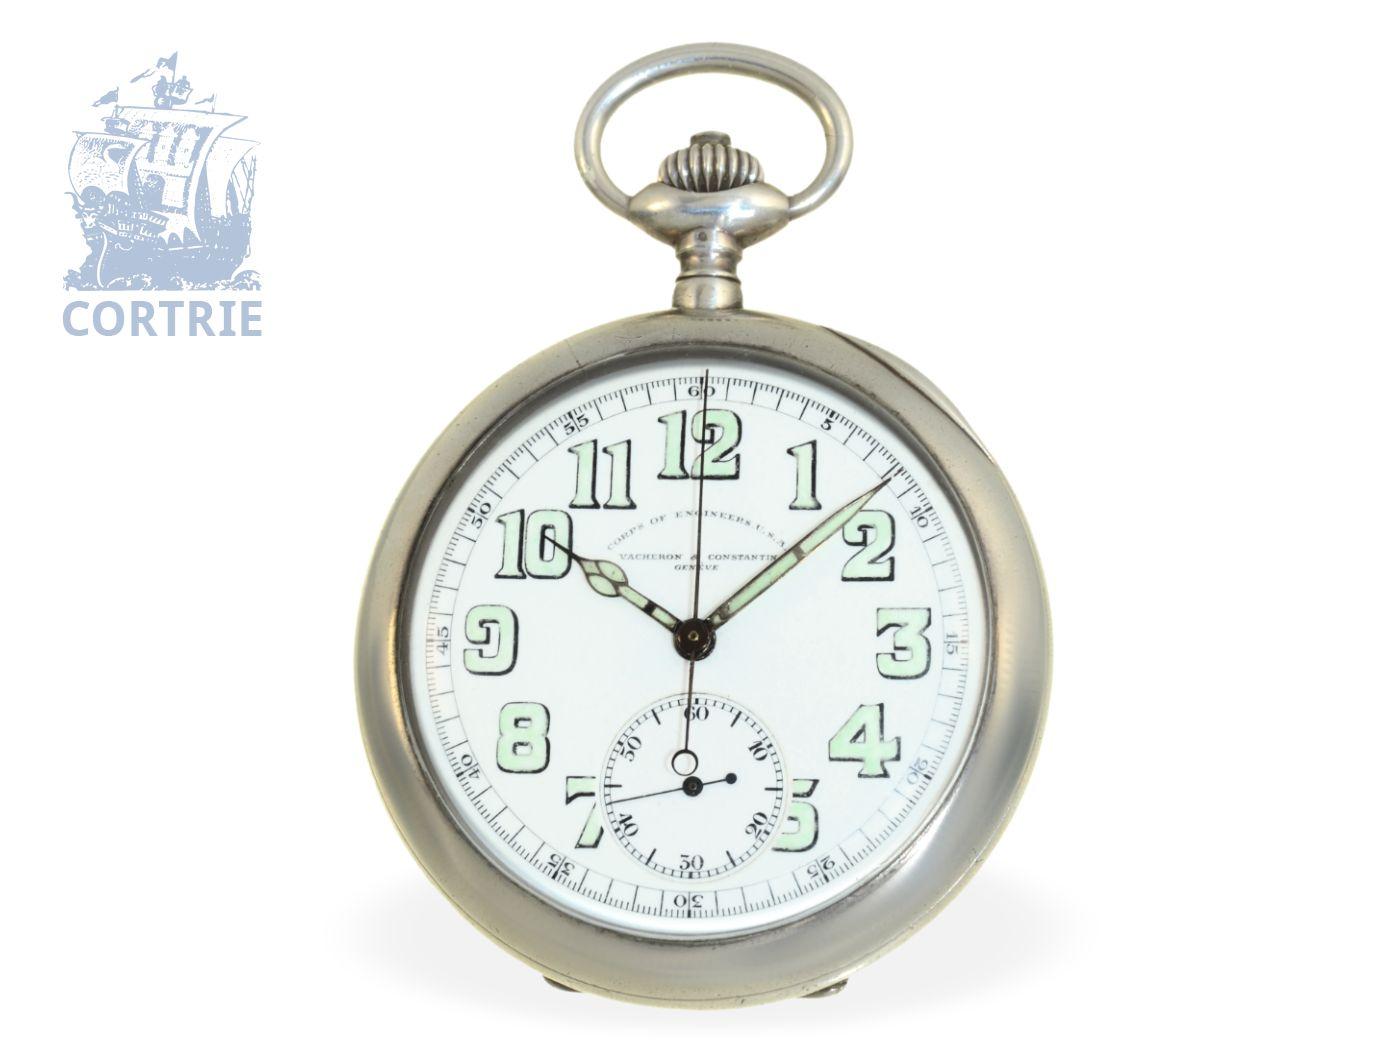 Pocket watch: rare Vacheron & Constantin military chronograph VACHERON & CONSTANTIN CORPS OF ENGINEERS USA, Geneva ca. 1920-